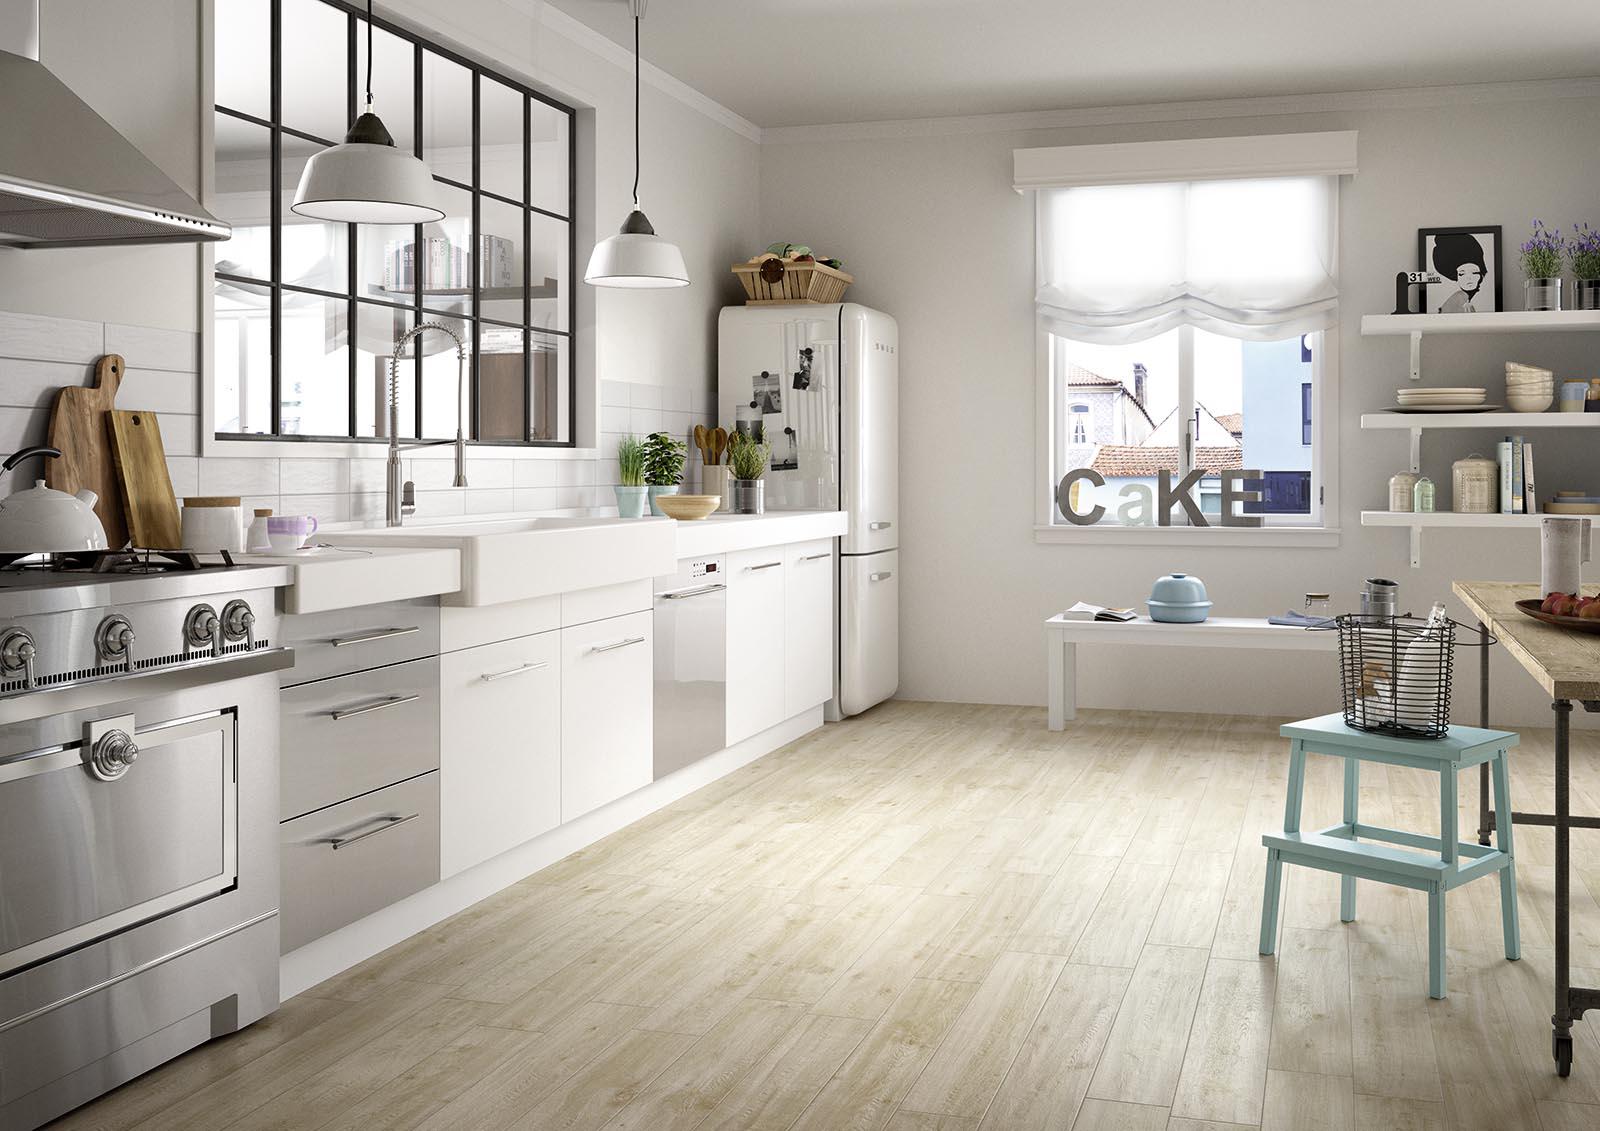 Vloertegels woonkamer houtlook beige 20X80